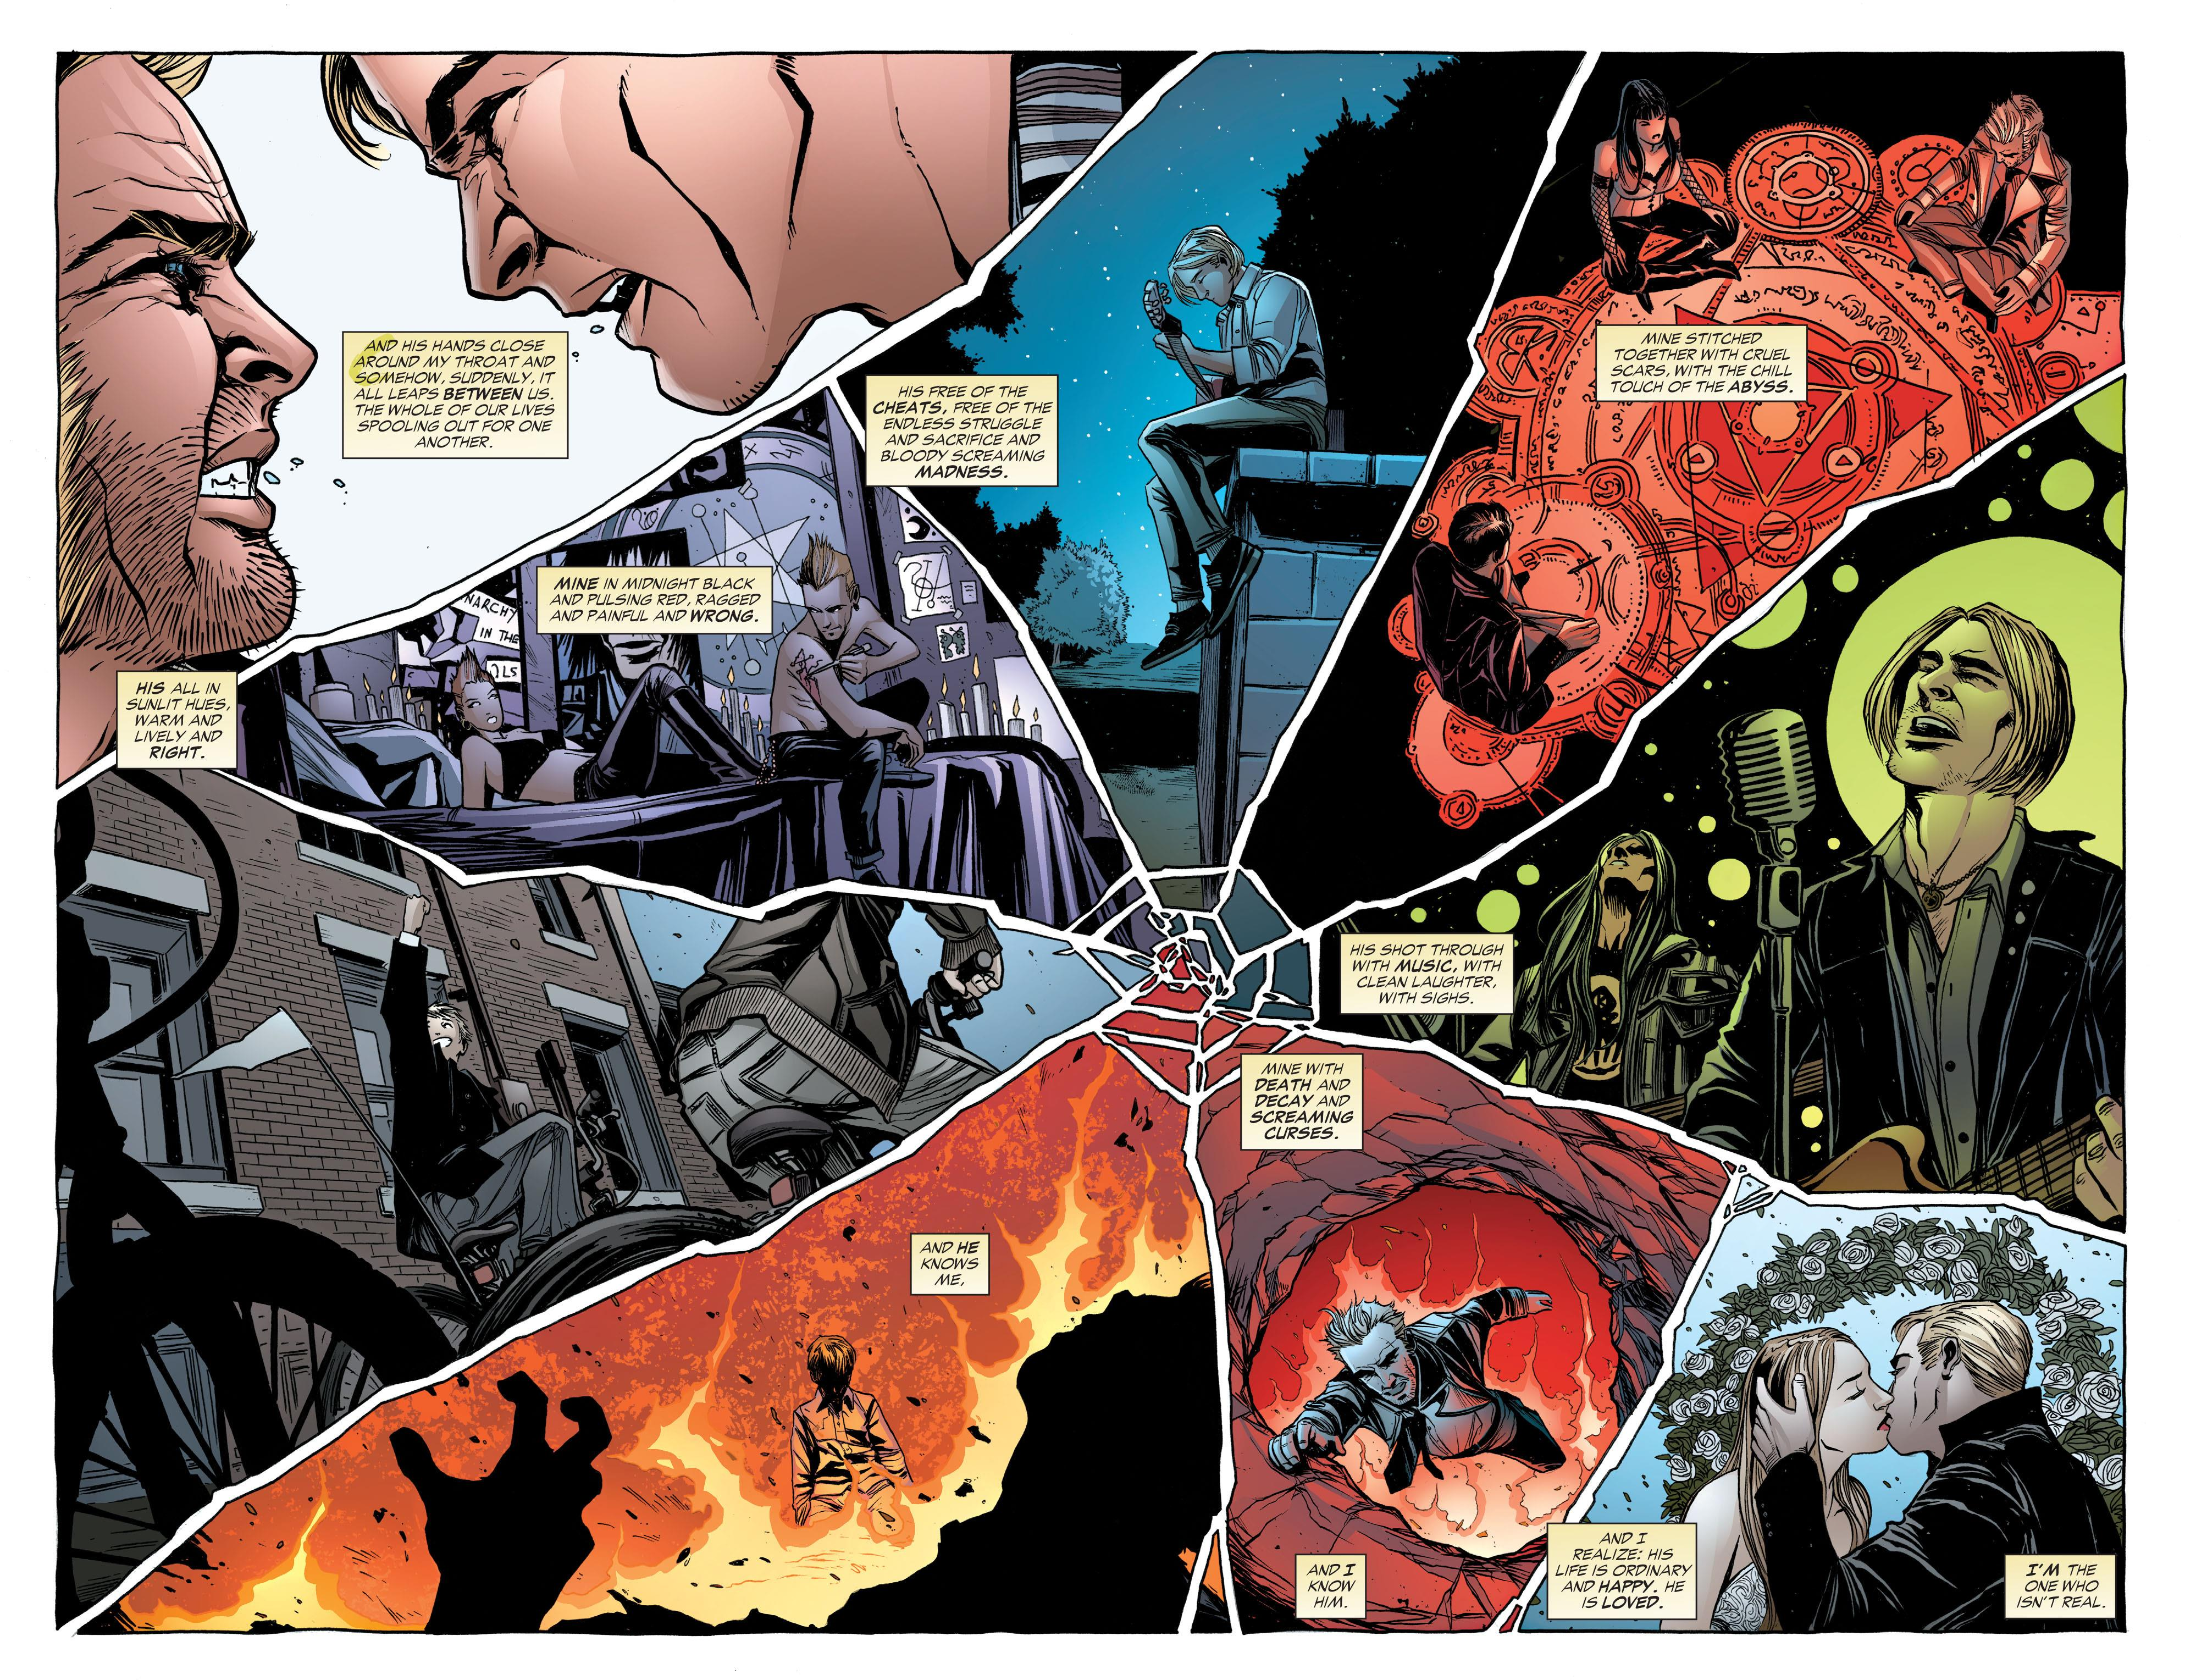 Constantine The Apocalypse Road review